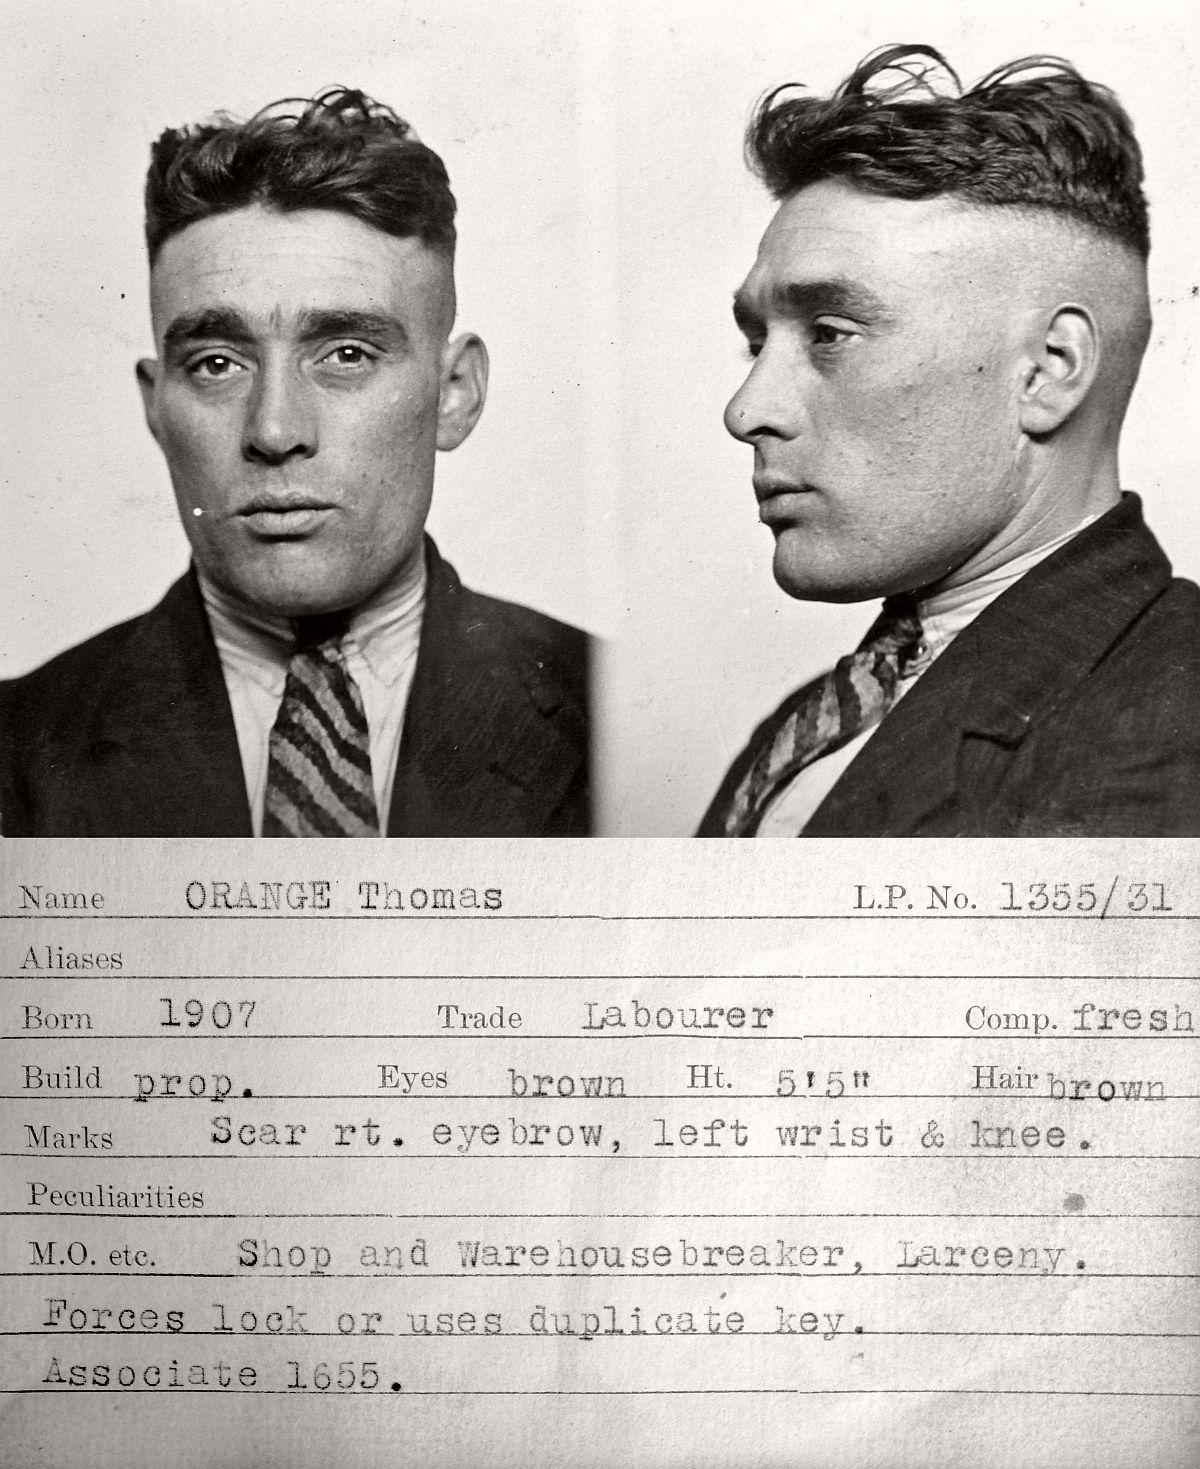 vintage-mug-shot-of-criminals-from-newcastle-upon-tyne-1930s-18